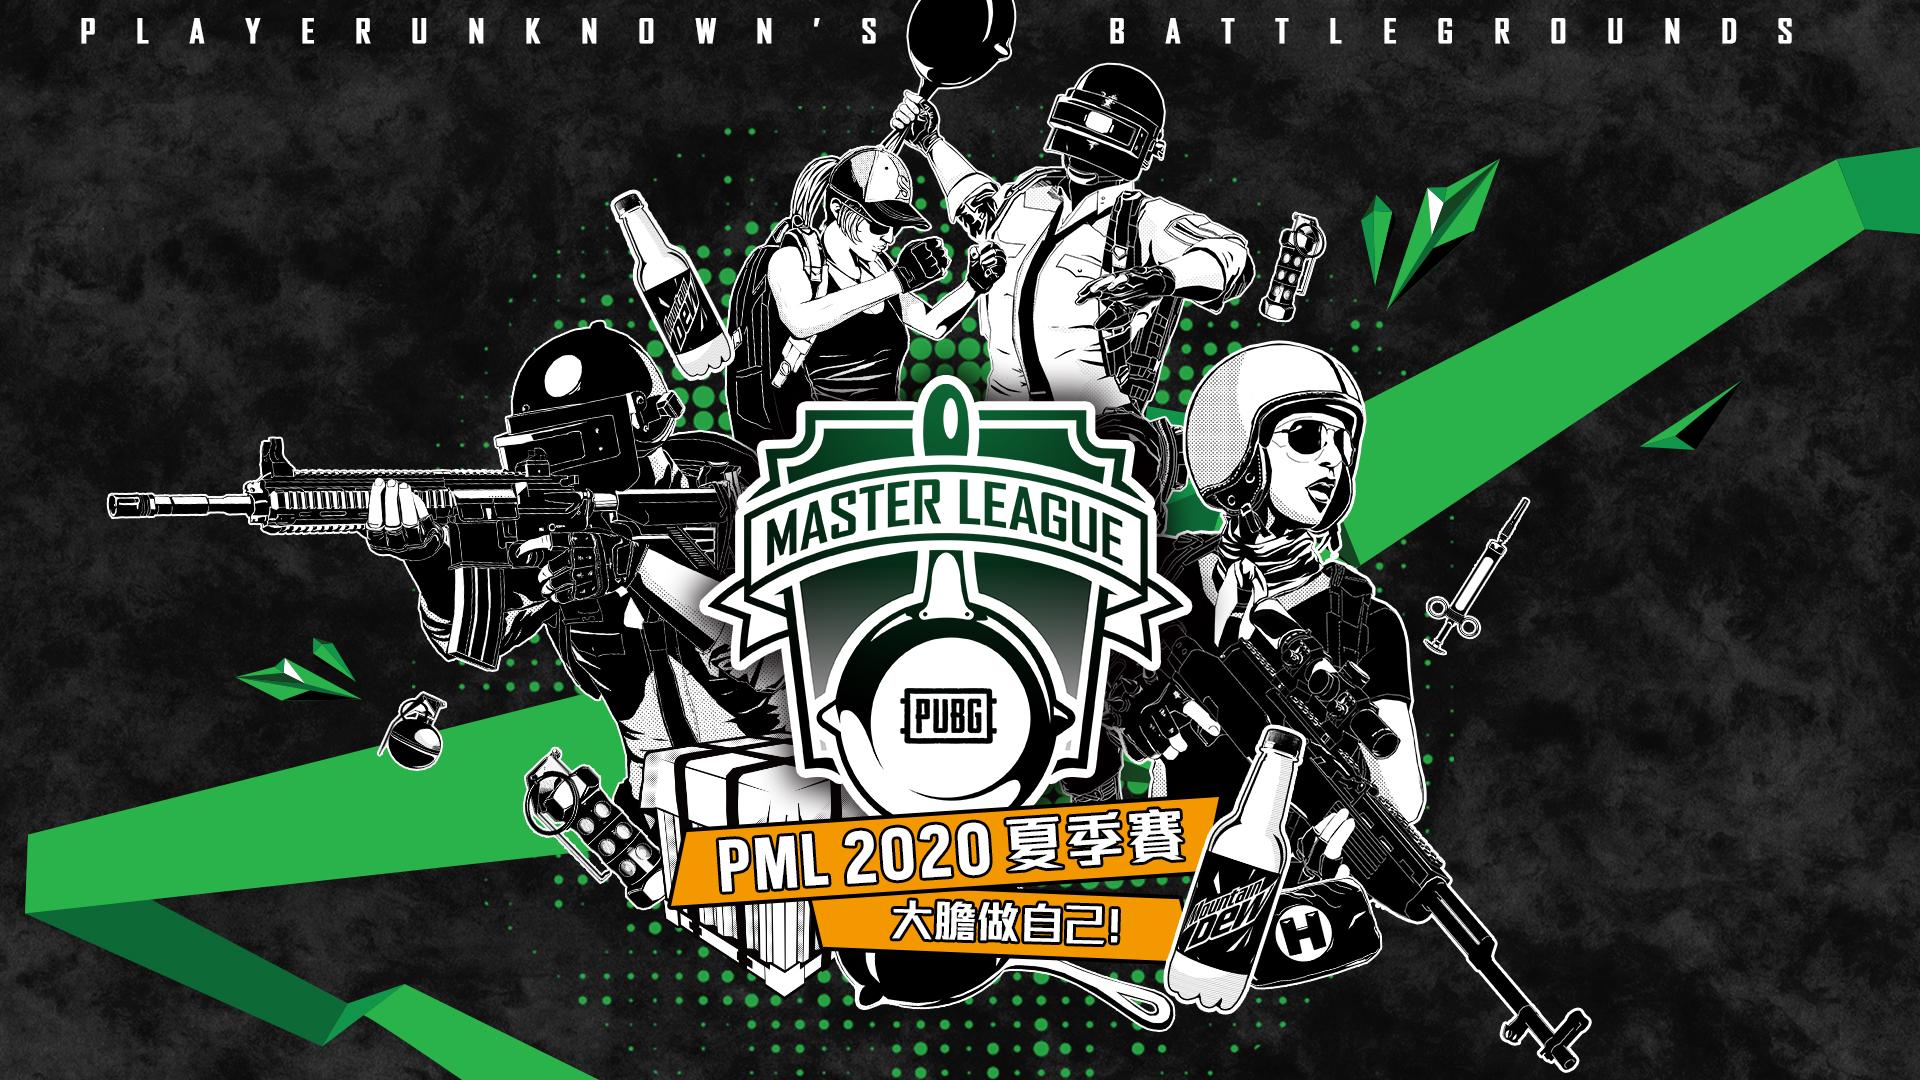 ▲PML 2020 SUMMER資格賽現正報名中!